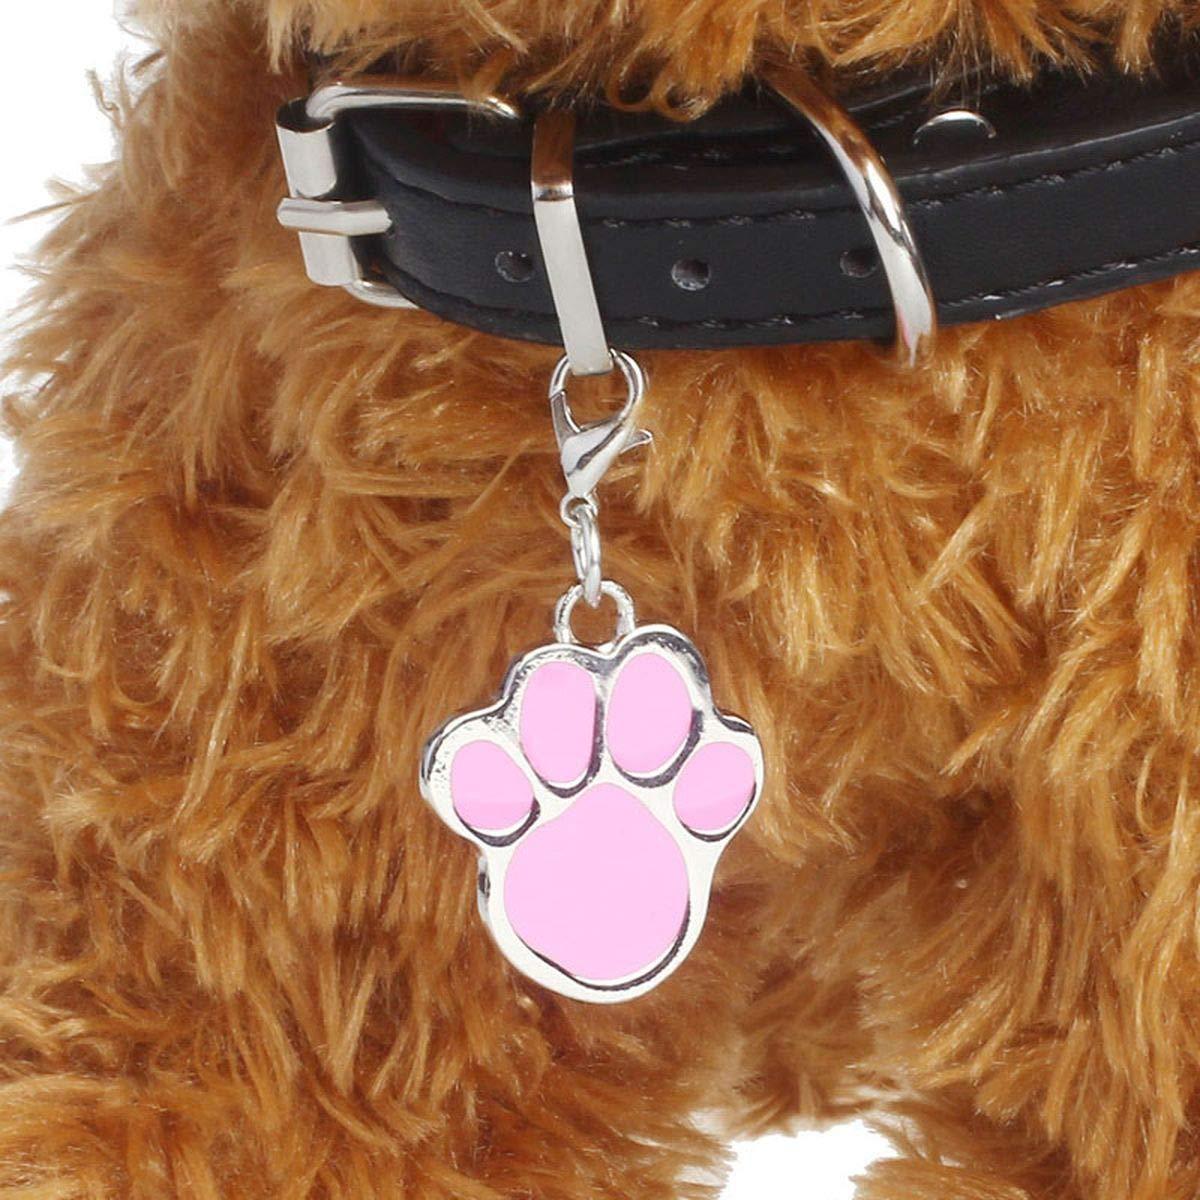 Meiliwanju Dog Pendant, Pet Dog Puppy Paw Print Metal Footprint Animal Pendant Charm Necklace LovelyPet Jewelry (Pink, One Size)